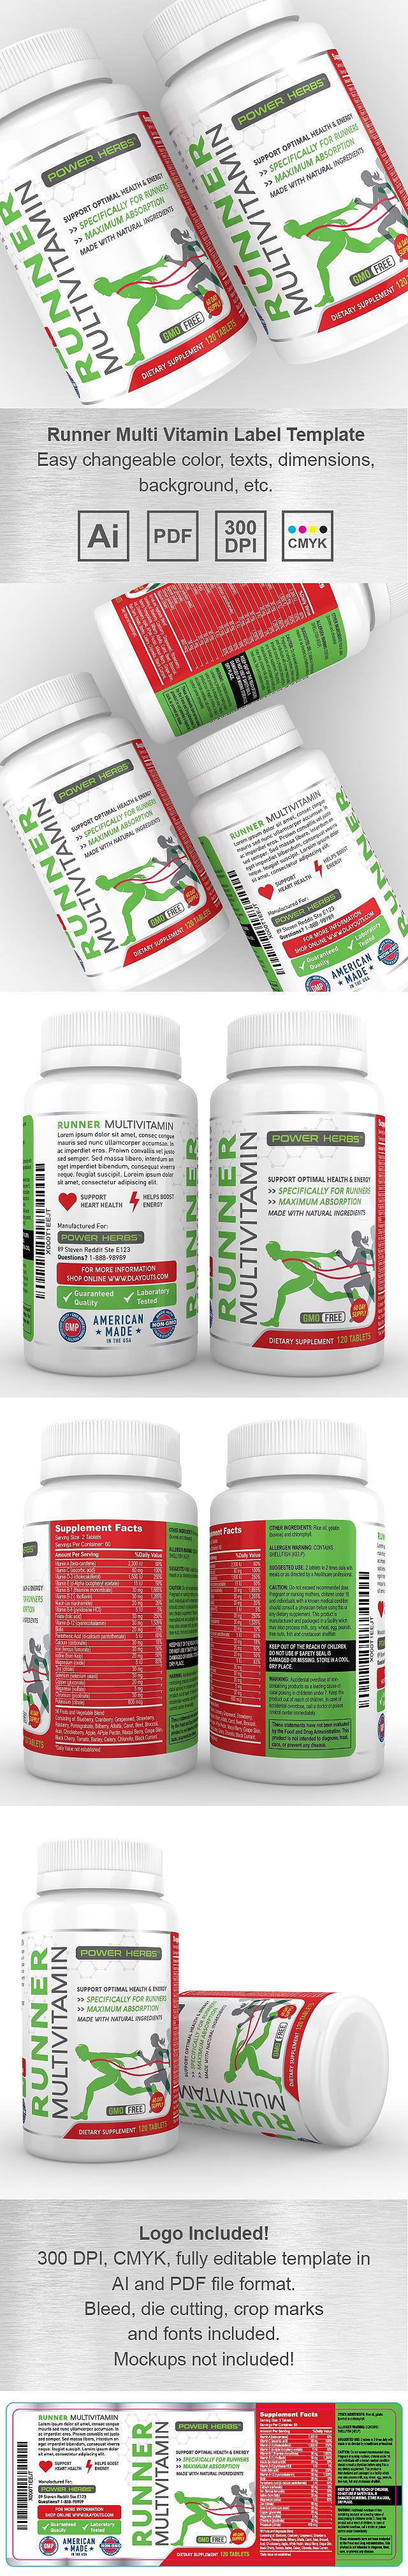 Runner Multi Vitamin Supplement Label Template